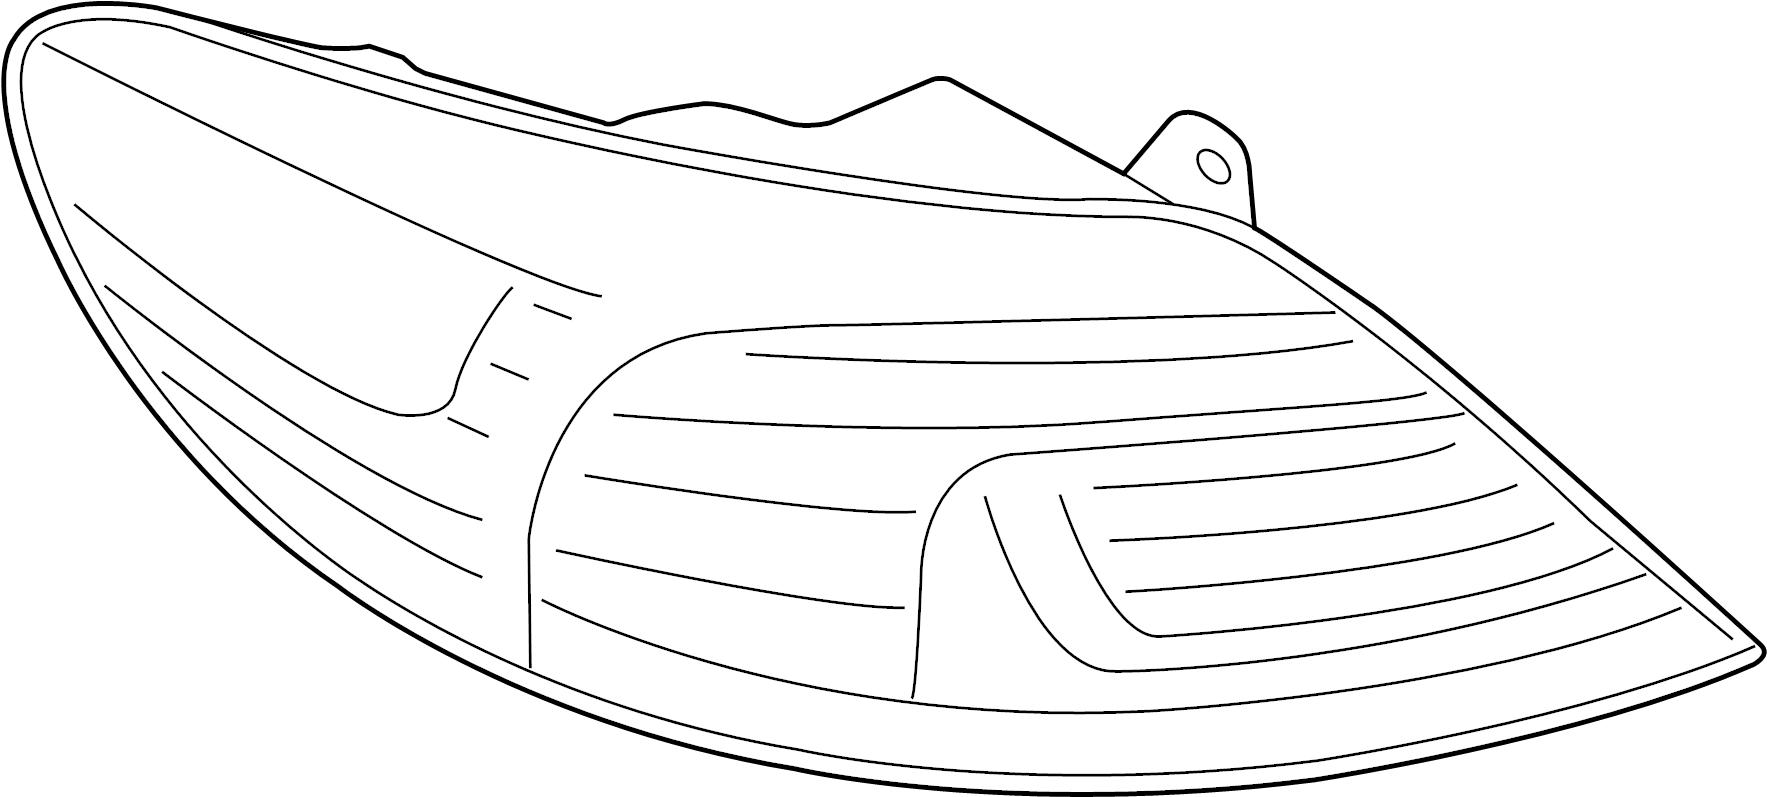 Volkswagen Beetle Convertible 2 0l Sulev M T Lamp